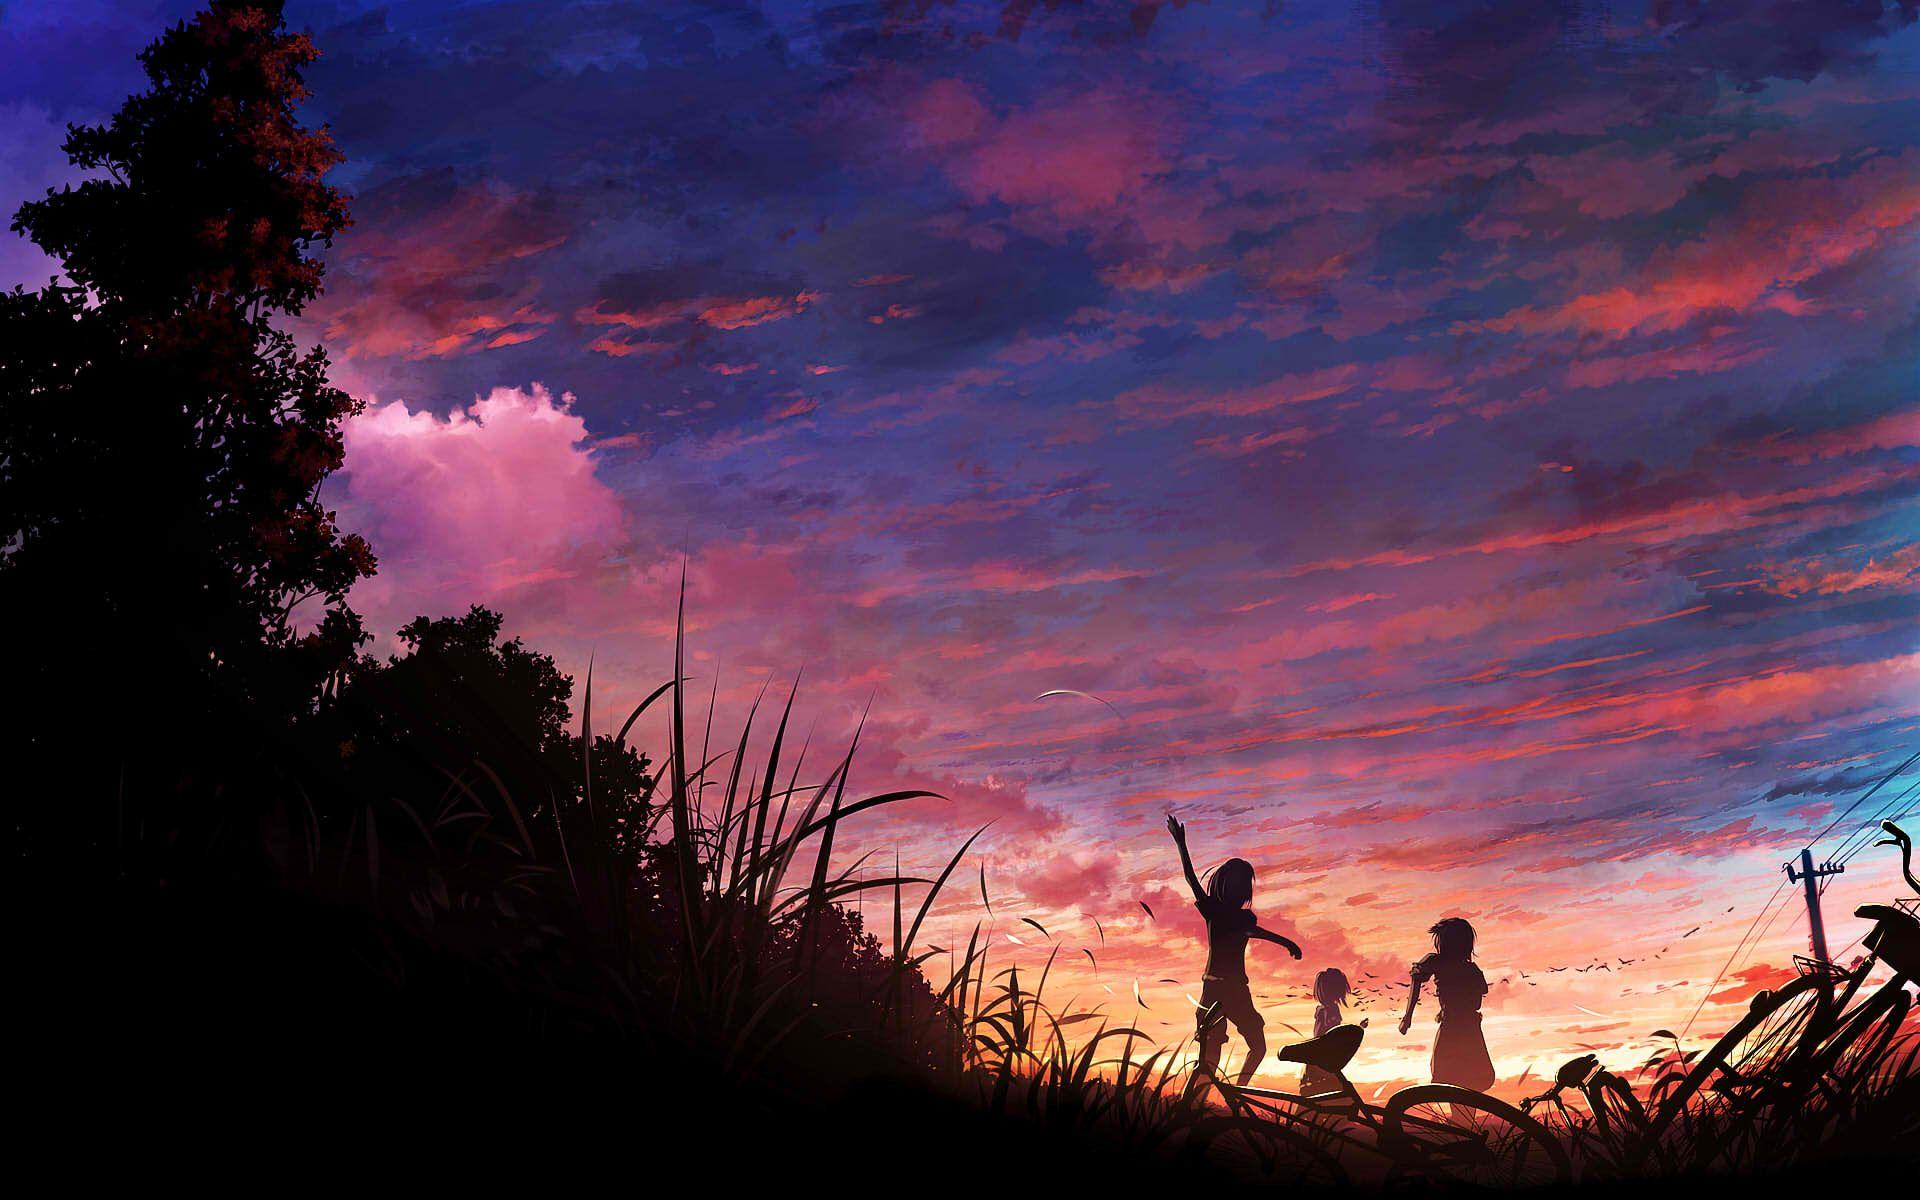 sunset cartooncomic pinterest anime scenery